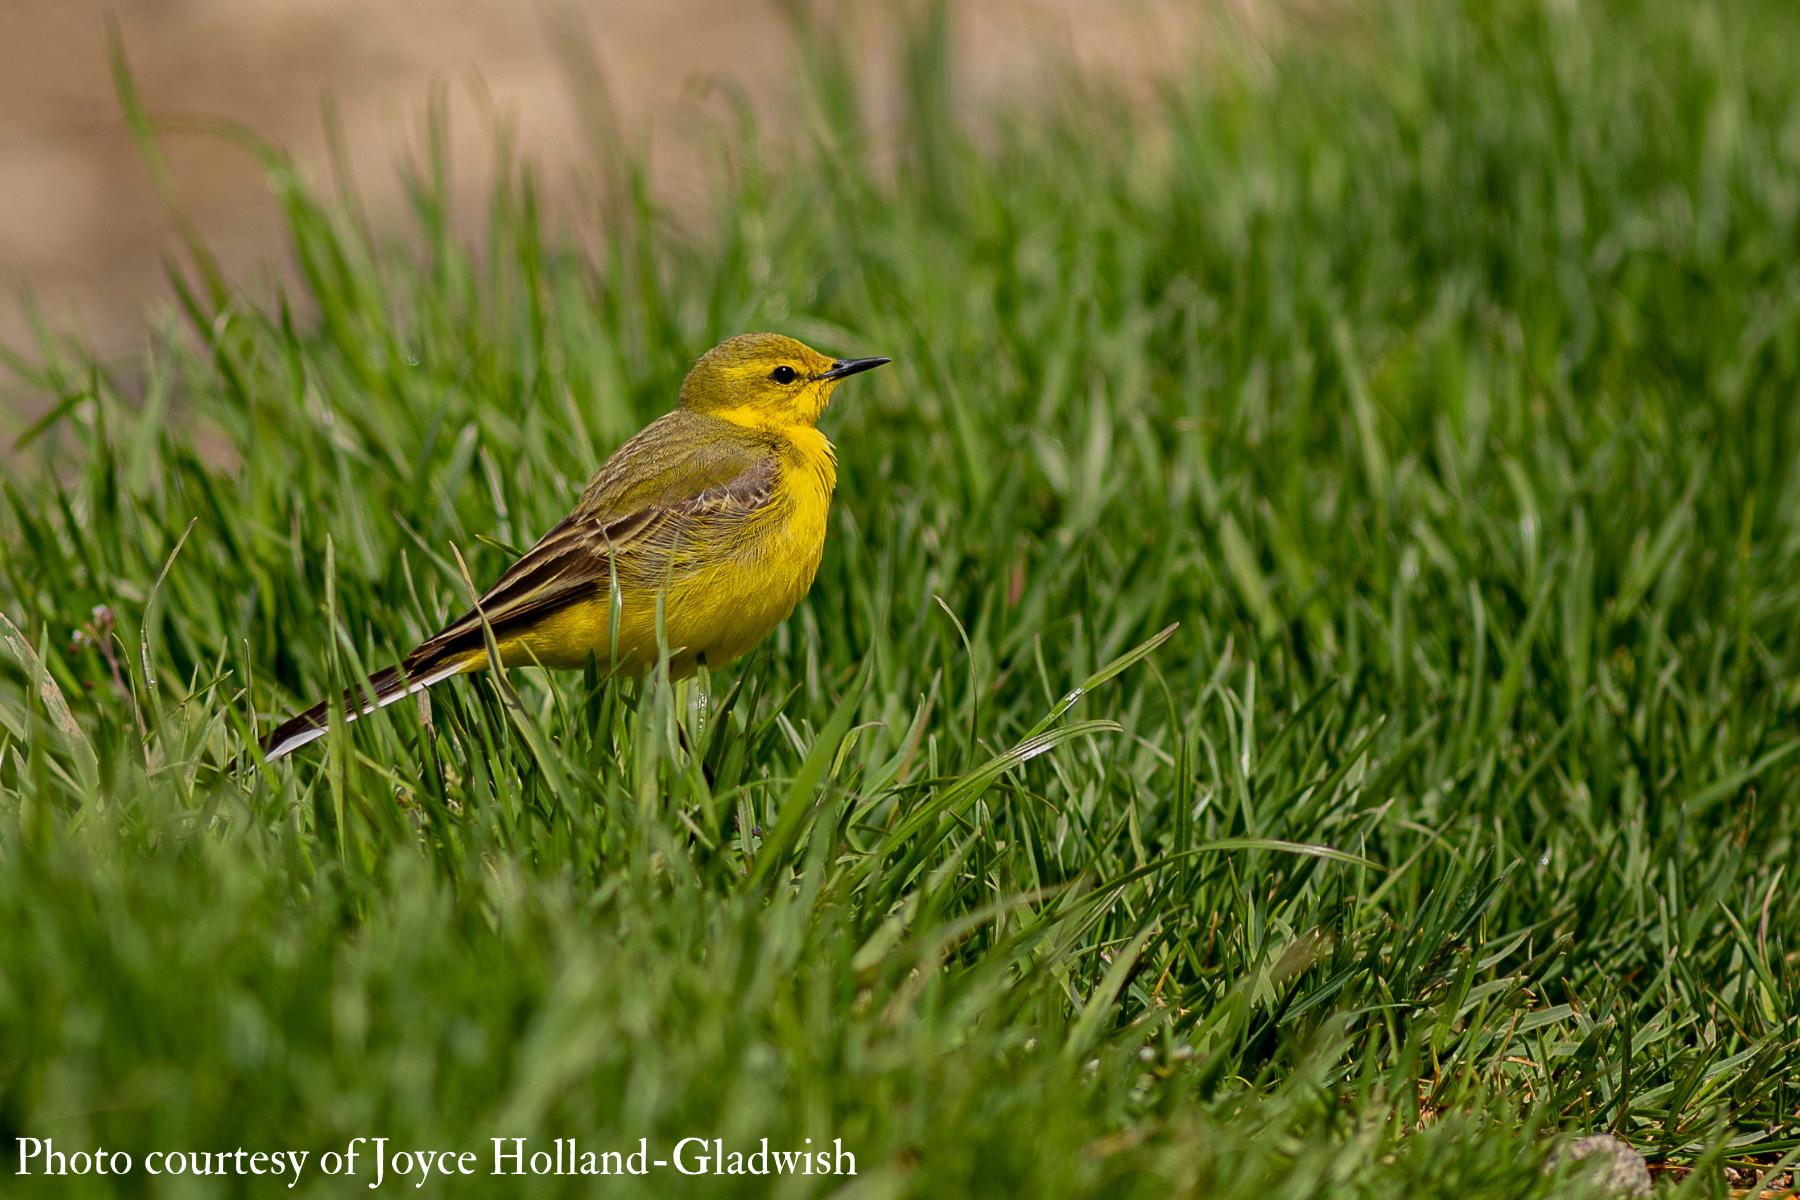 Yellow Wagtail (Motacilla flava) 2021 Joyce Holland-Gladwish